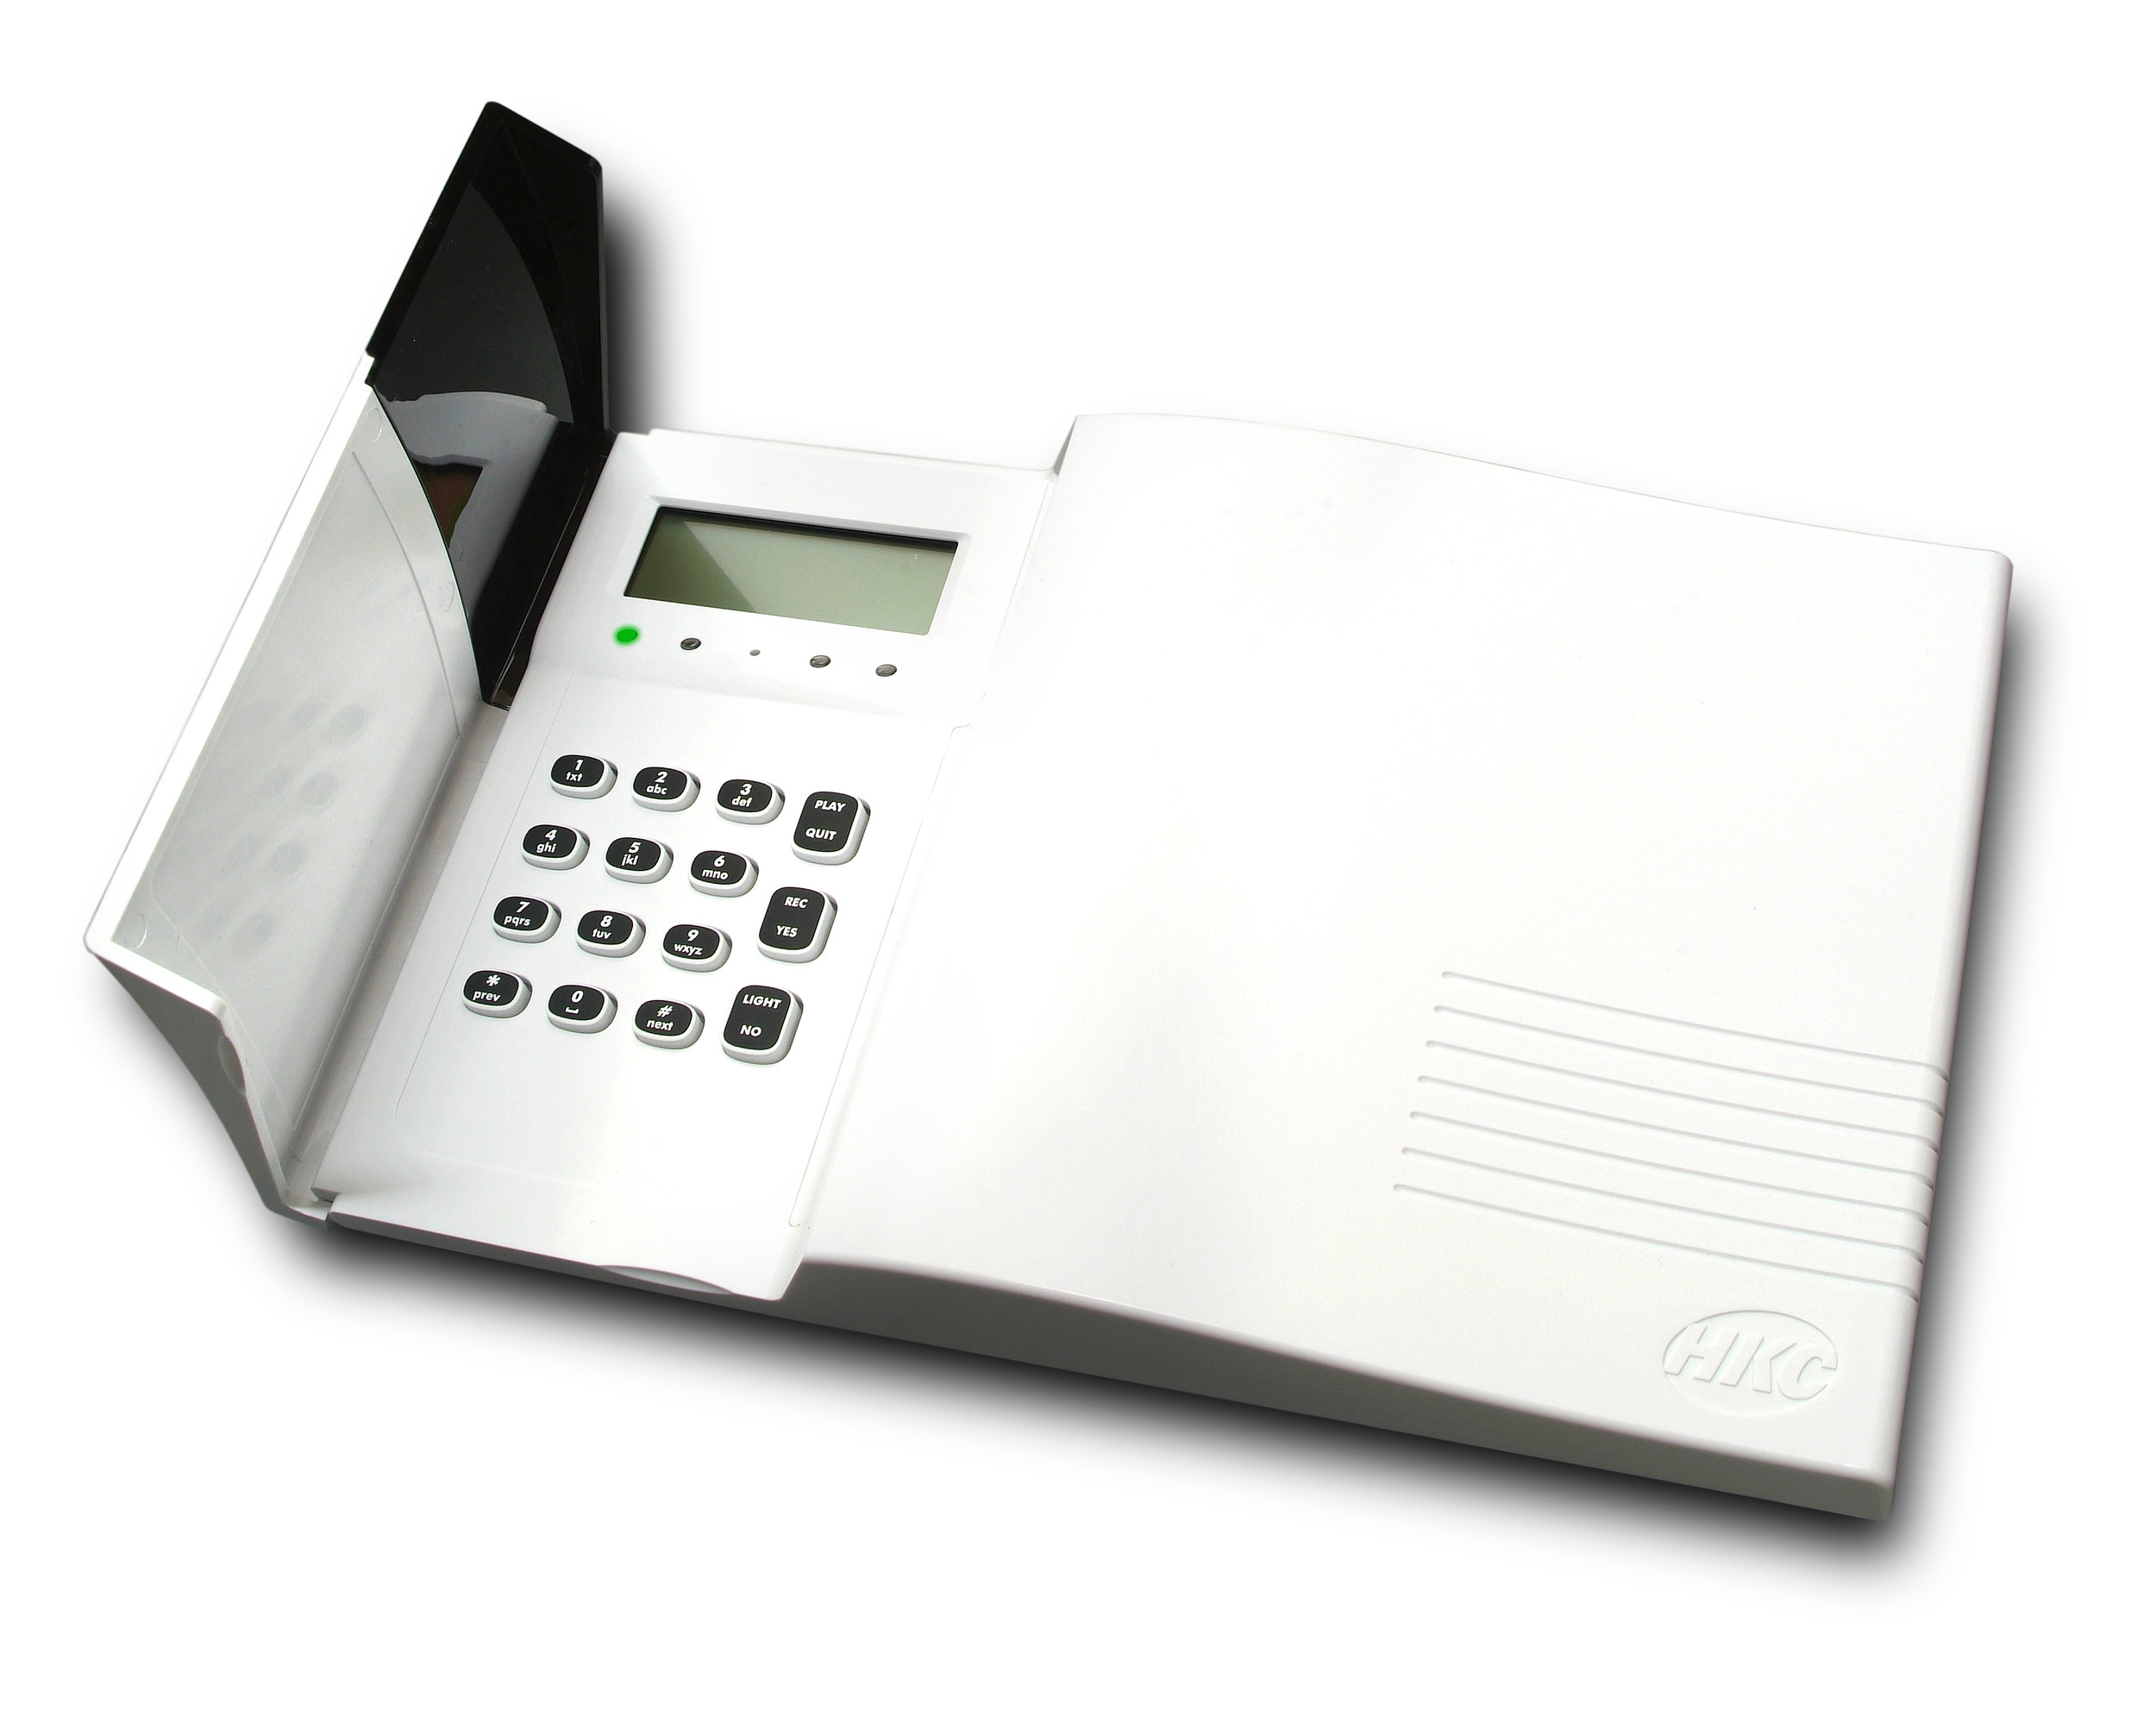 Wireless Intruder Alarm Control Panel